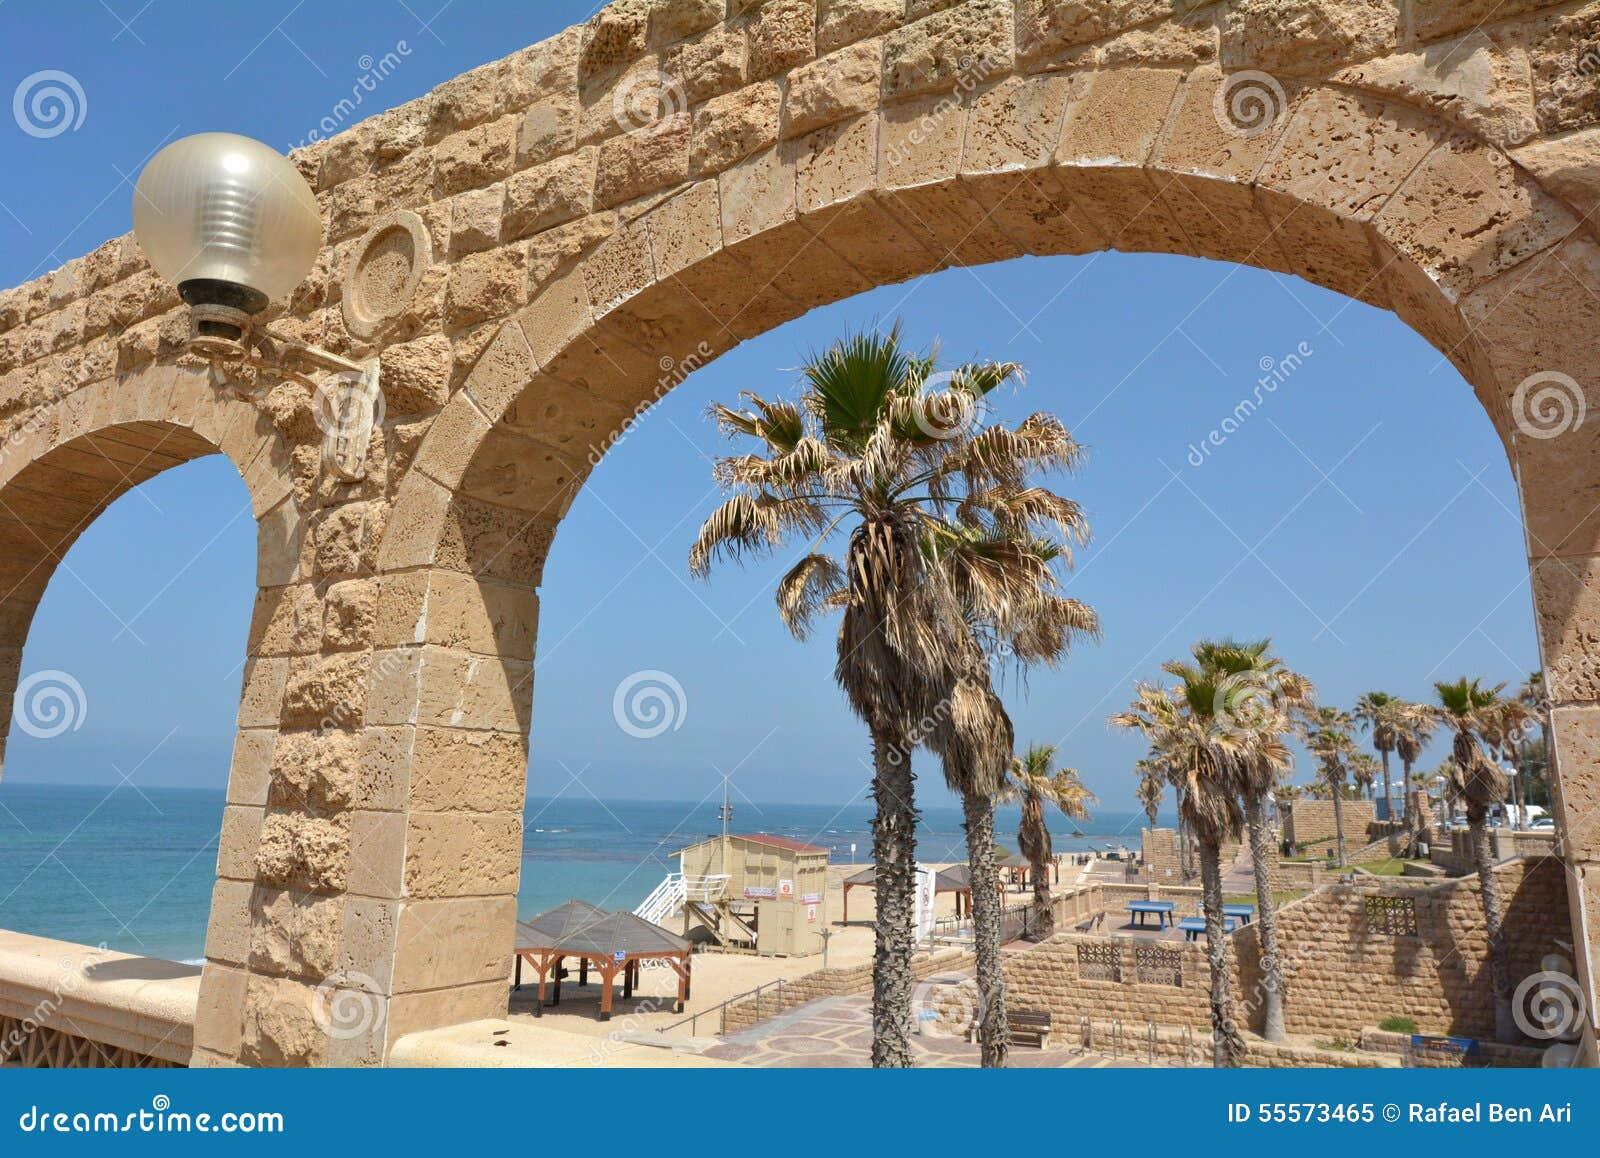 Jaffa beach in Tel Aviv Jaffa - Israel